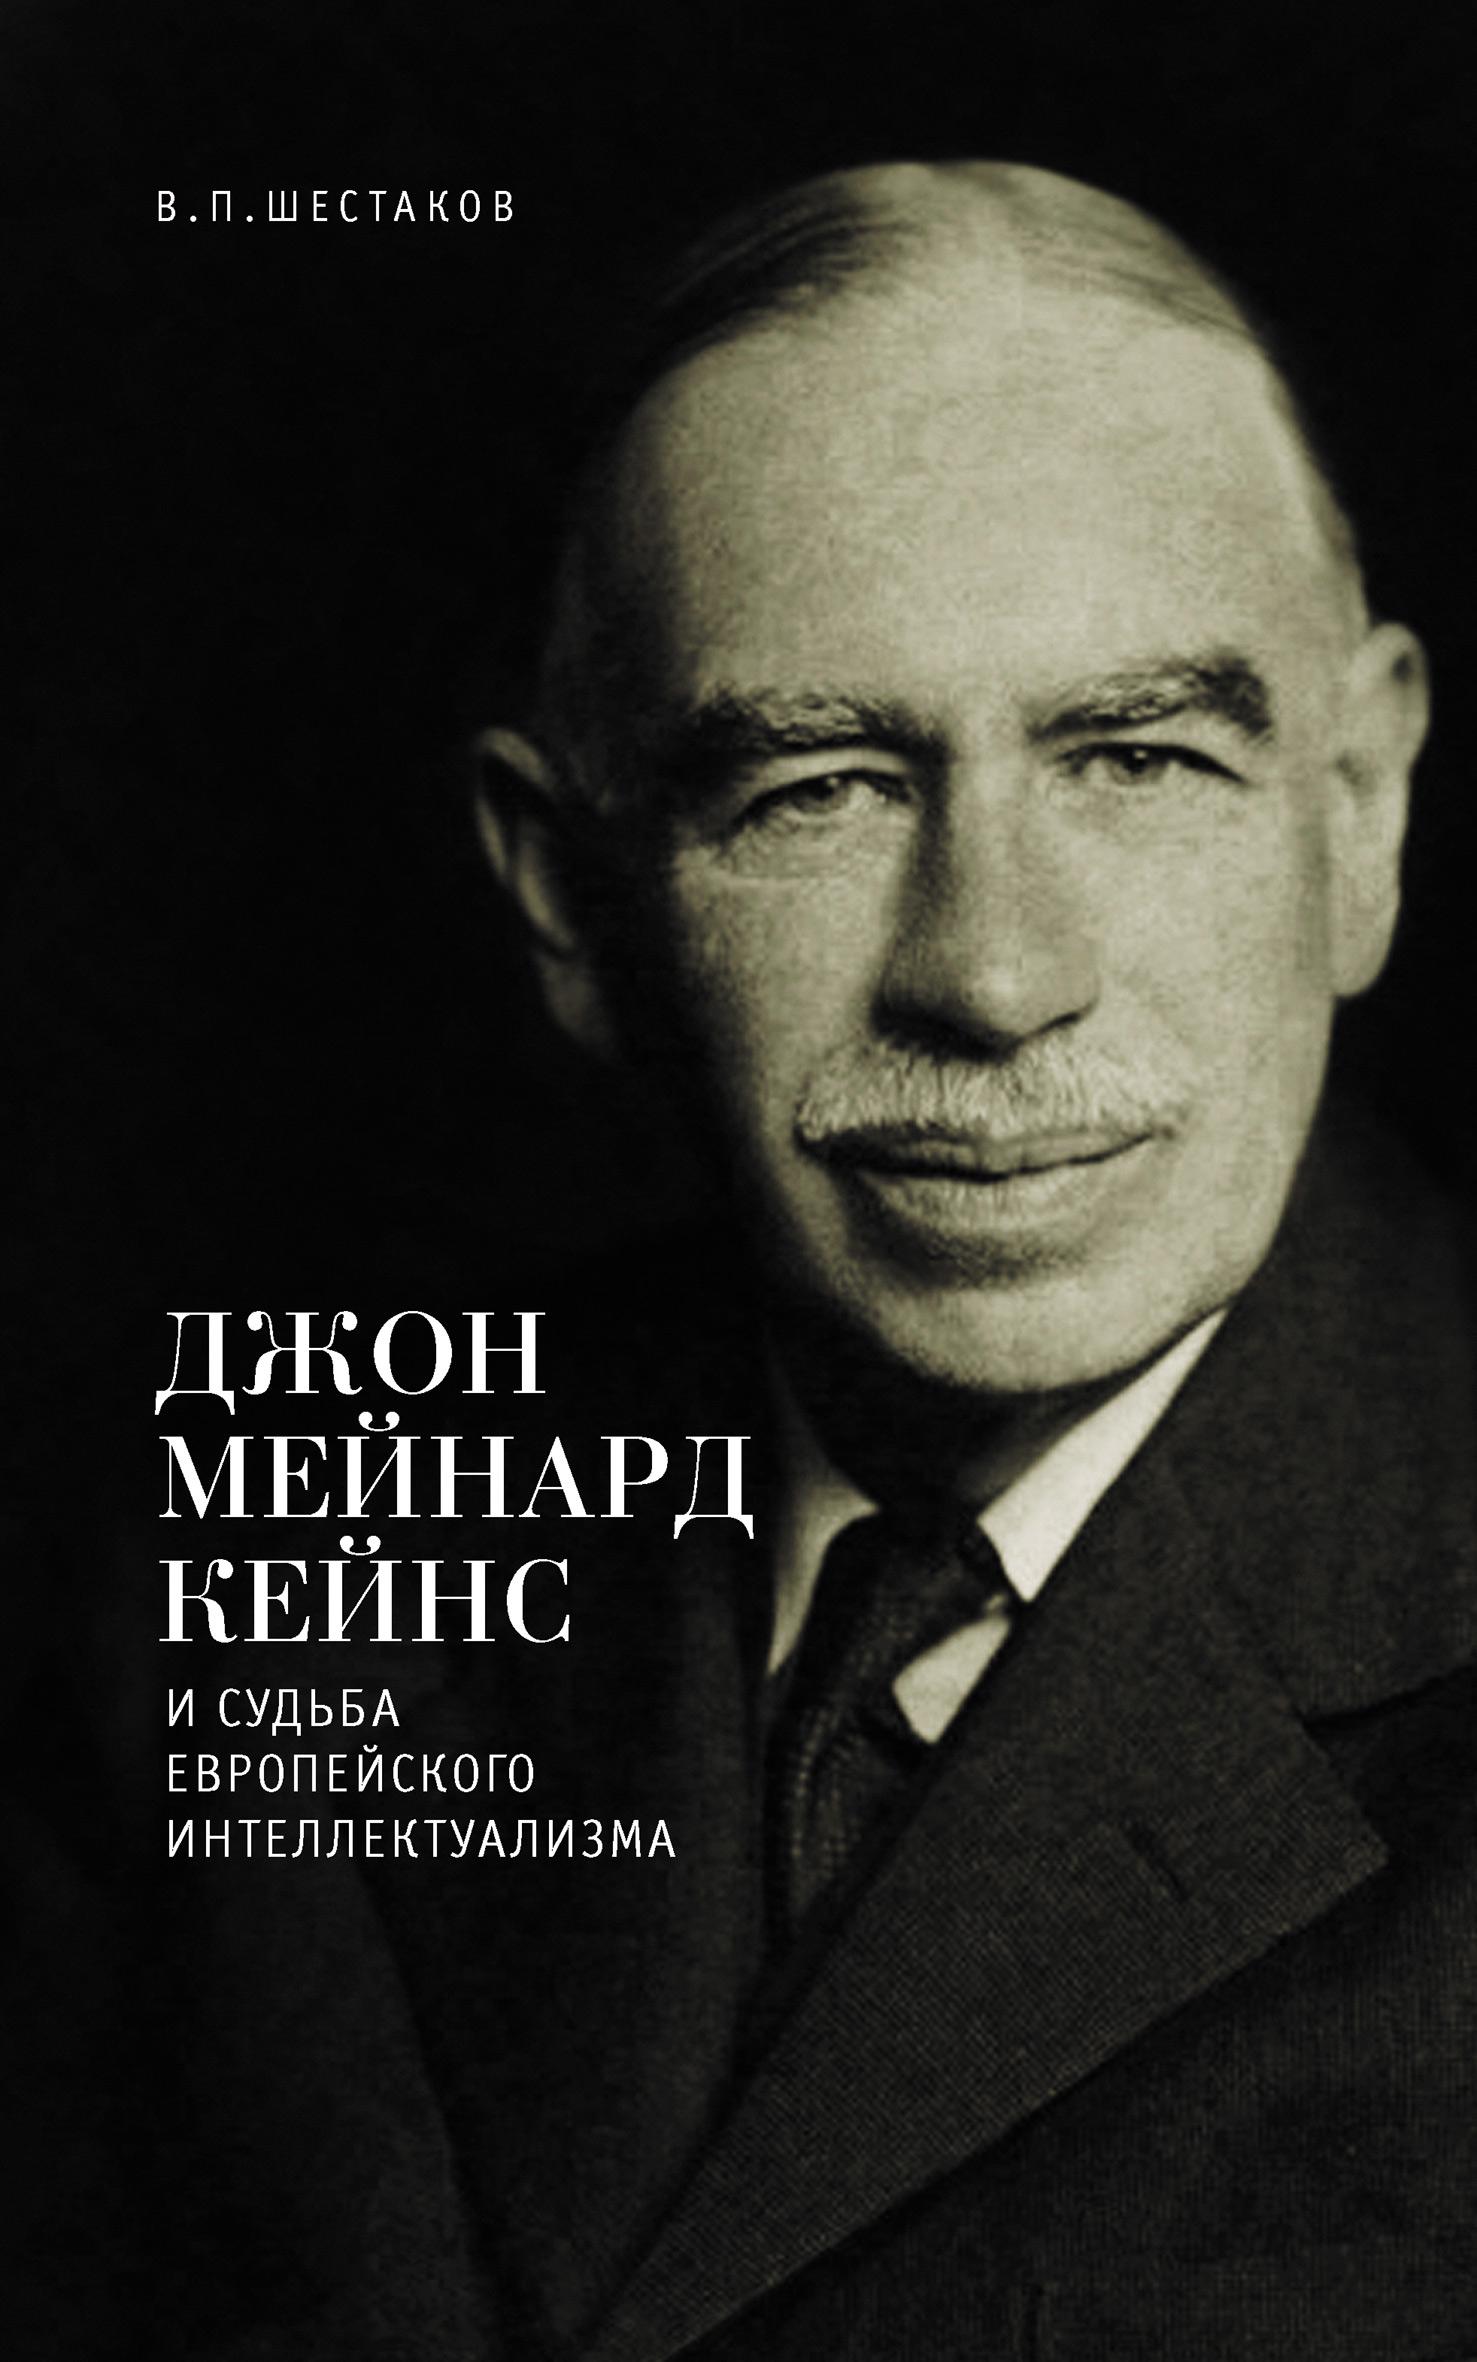 Вячеслав Шестаков Джон Мейнард Кейнс и судьба европейского интеллектуализма шестаков в п джон мейнард кейнс и судьба европейского интеллектуализма